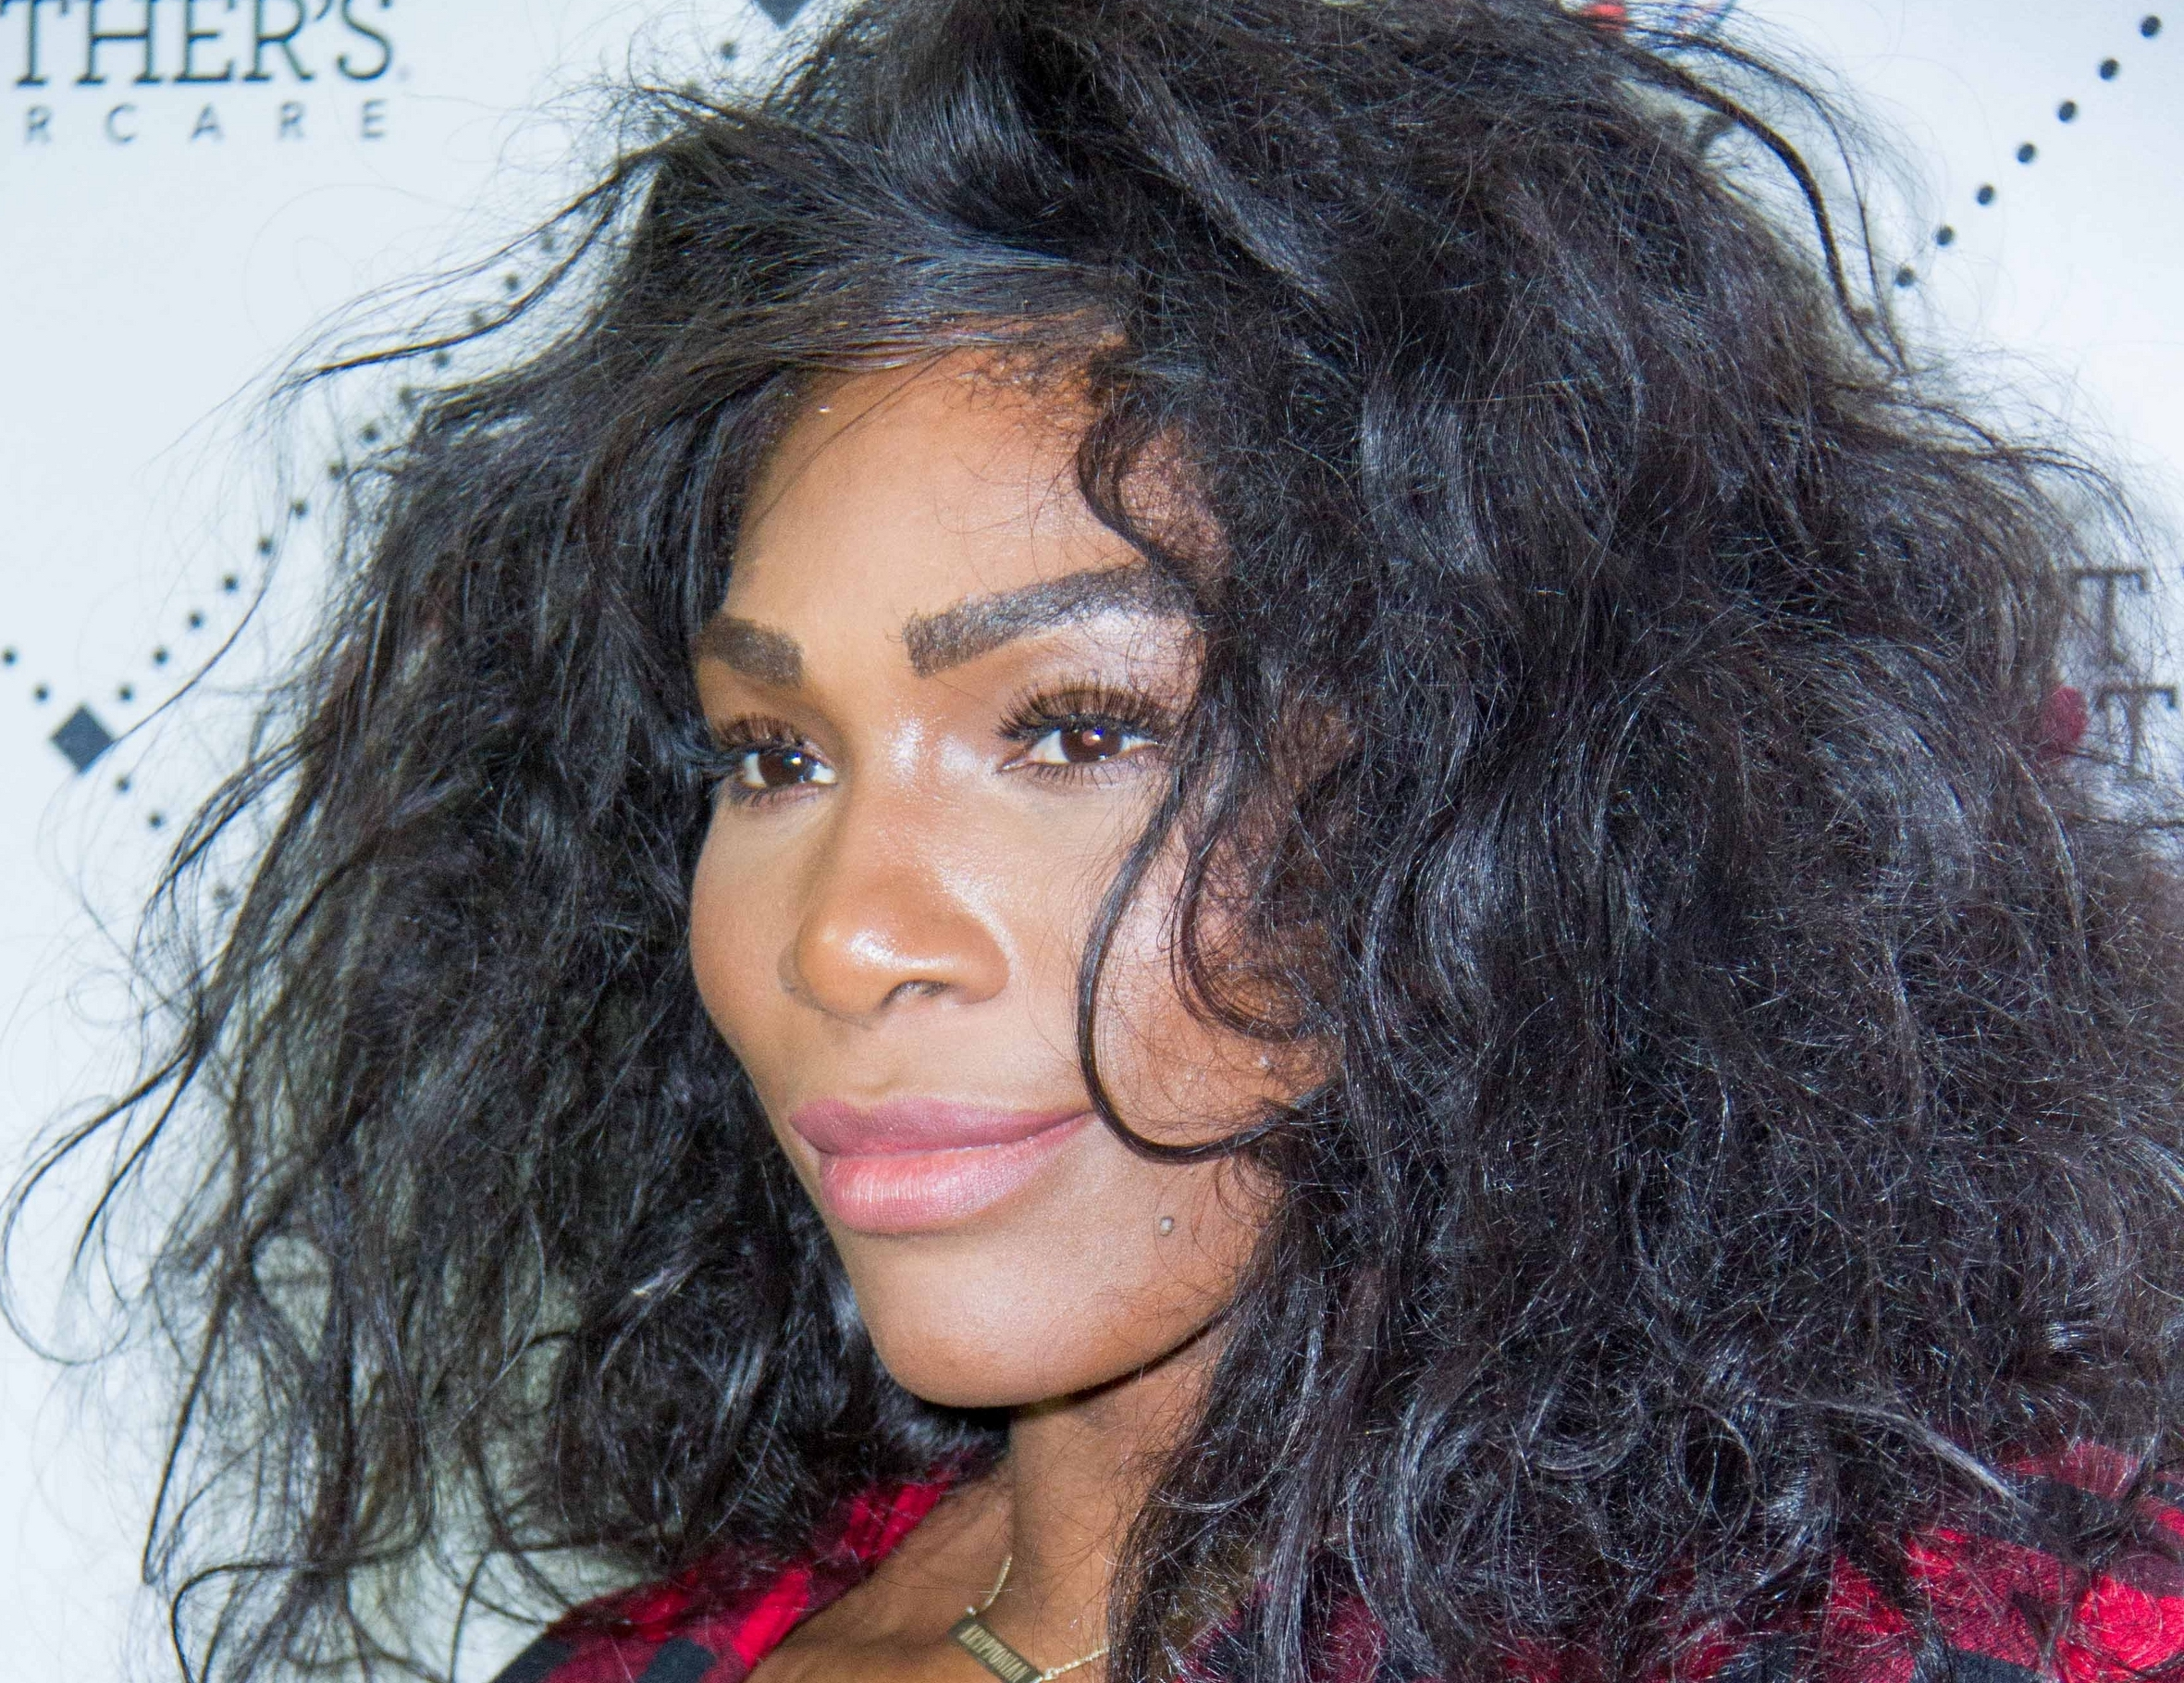 Black celebrity serena williams 2 7